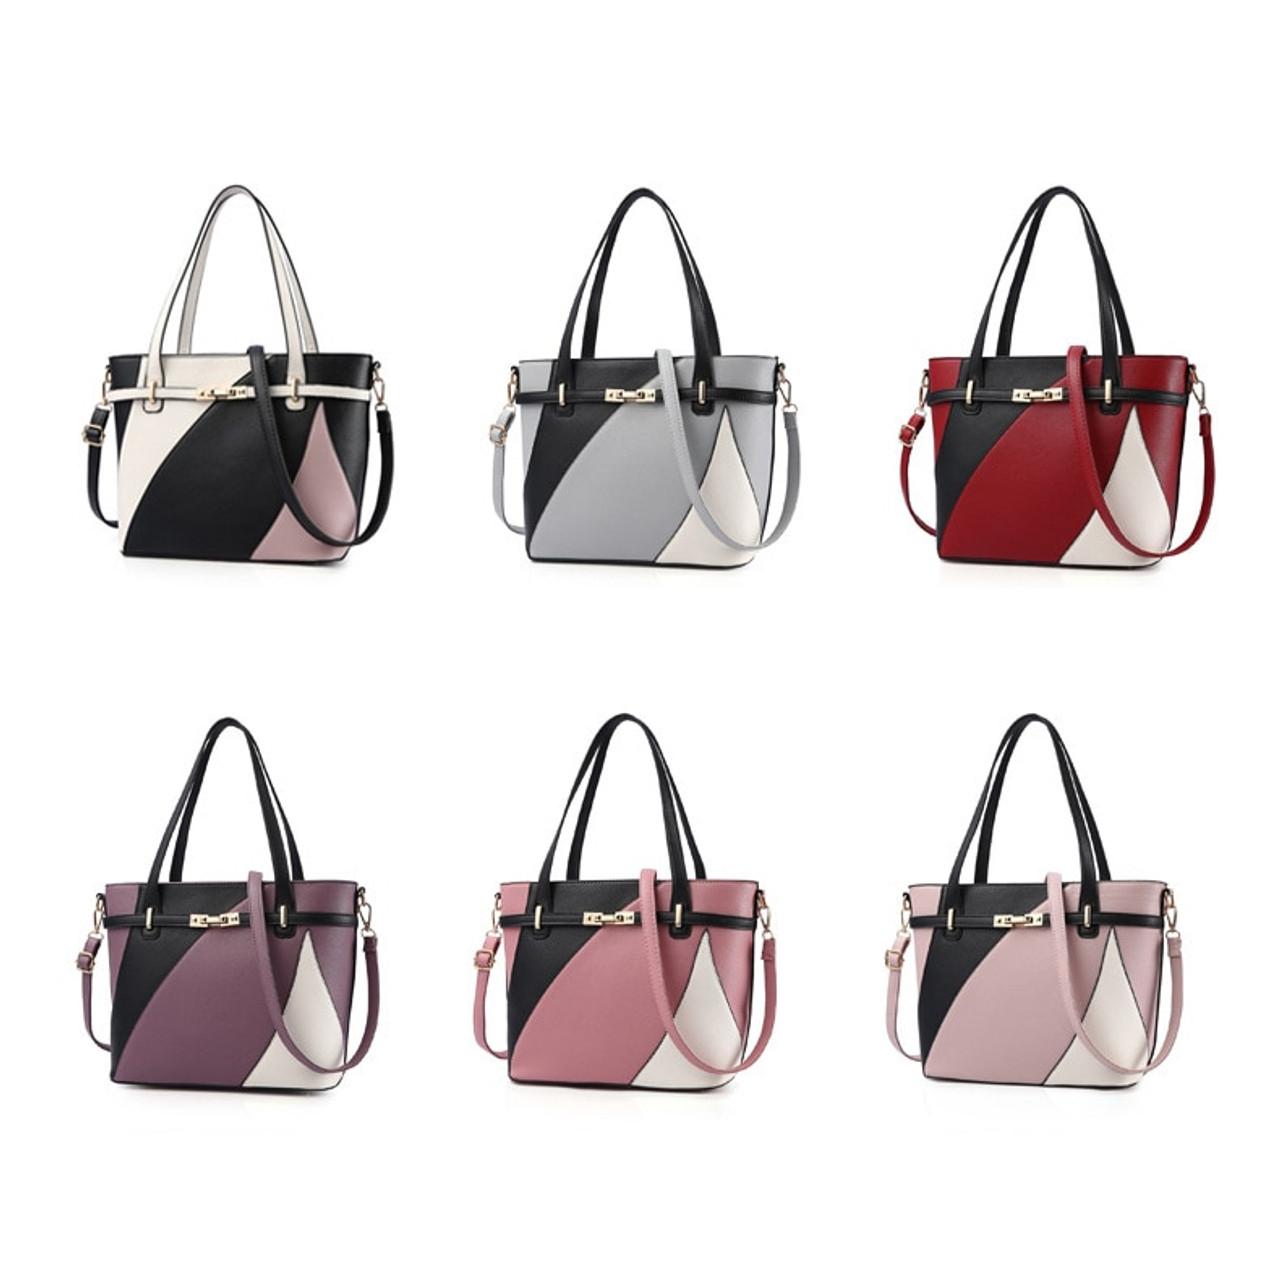 0e1e2b54b94 Aliwood Europe New Women's Handbags Shoulder bag Ladies' Leather Messenger  Bag Large Capacity Design Fashion Crossbody Bags Tote